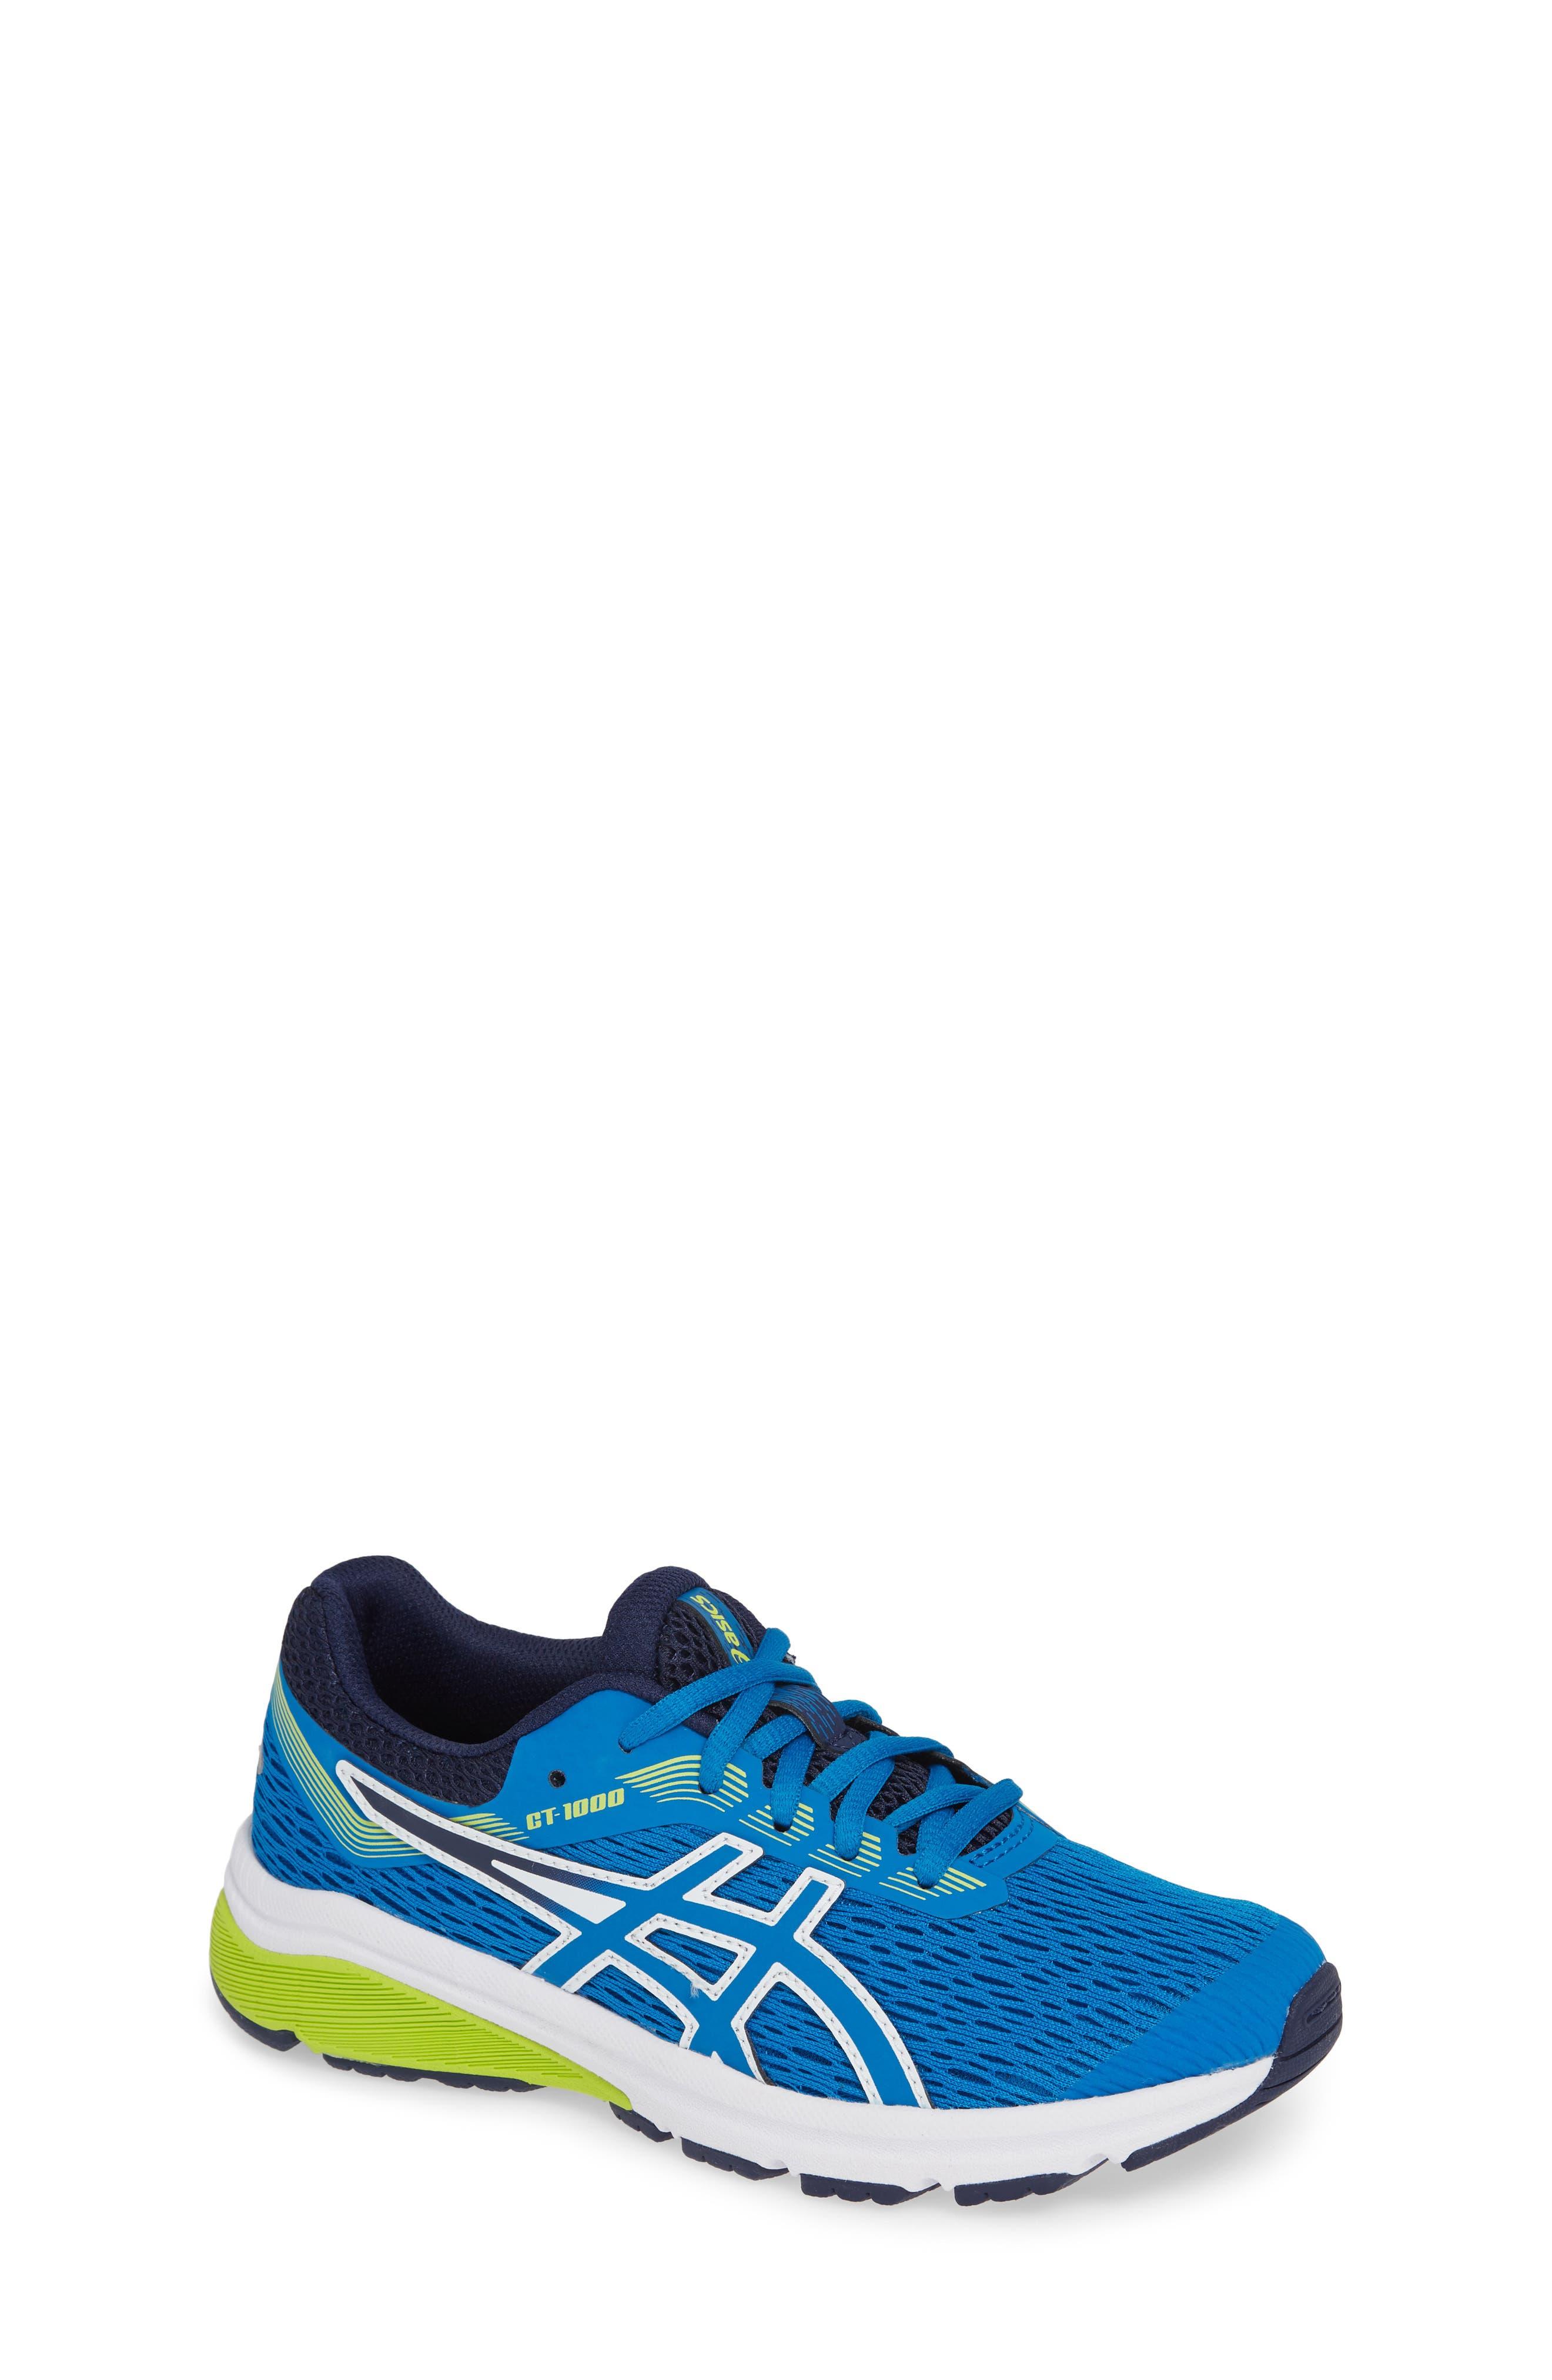 Kids Asics Gt 1000 7 Running Shoe Size 7 M  Blue